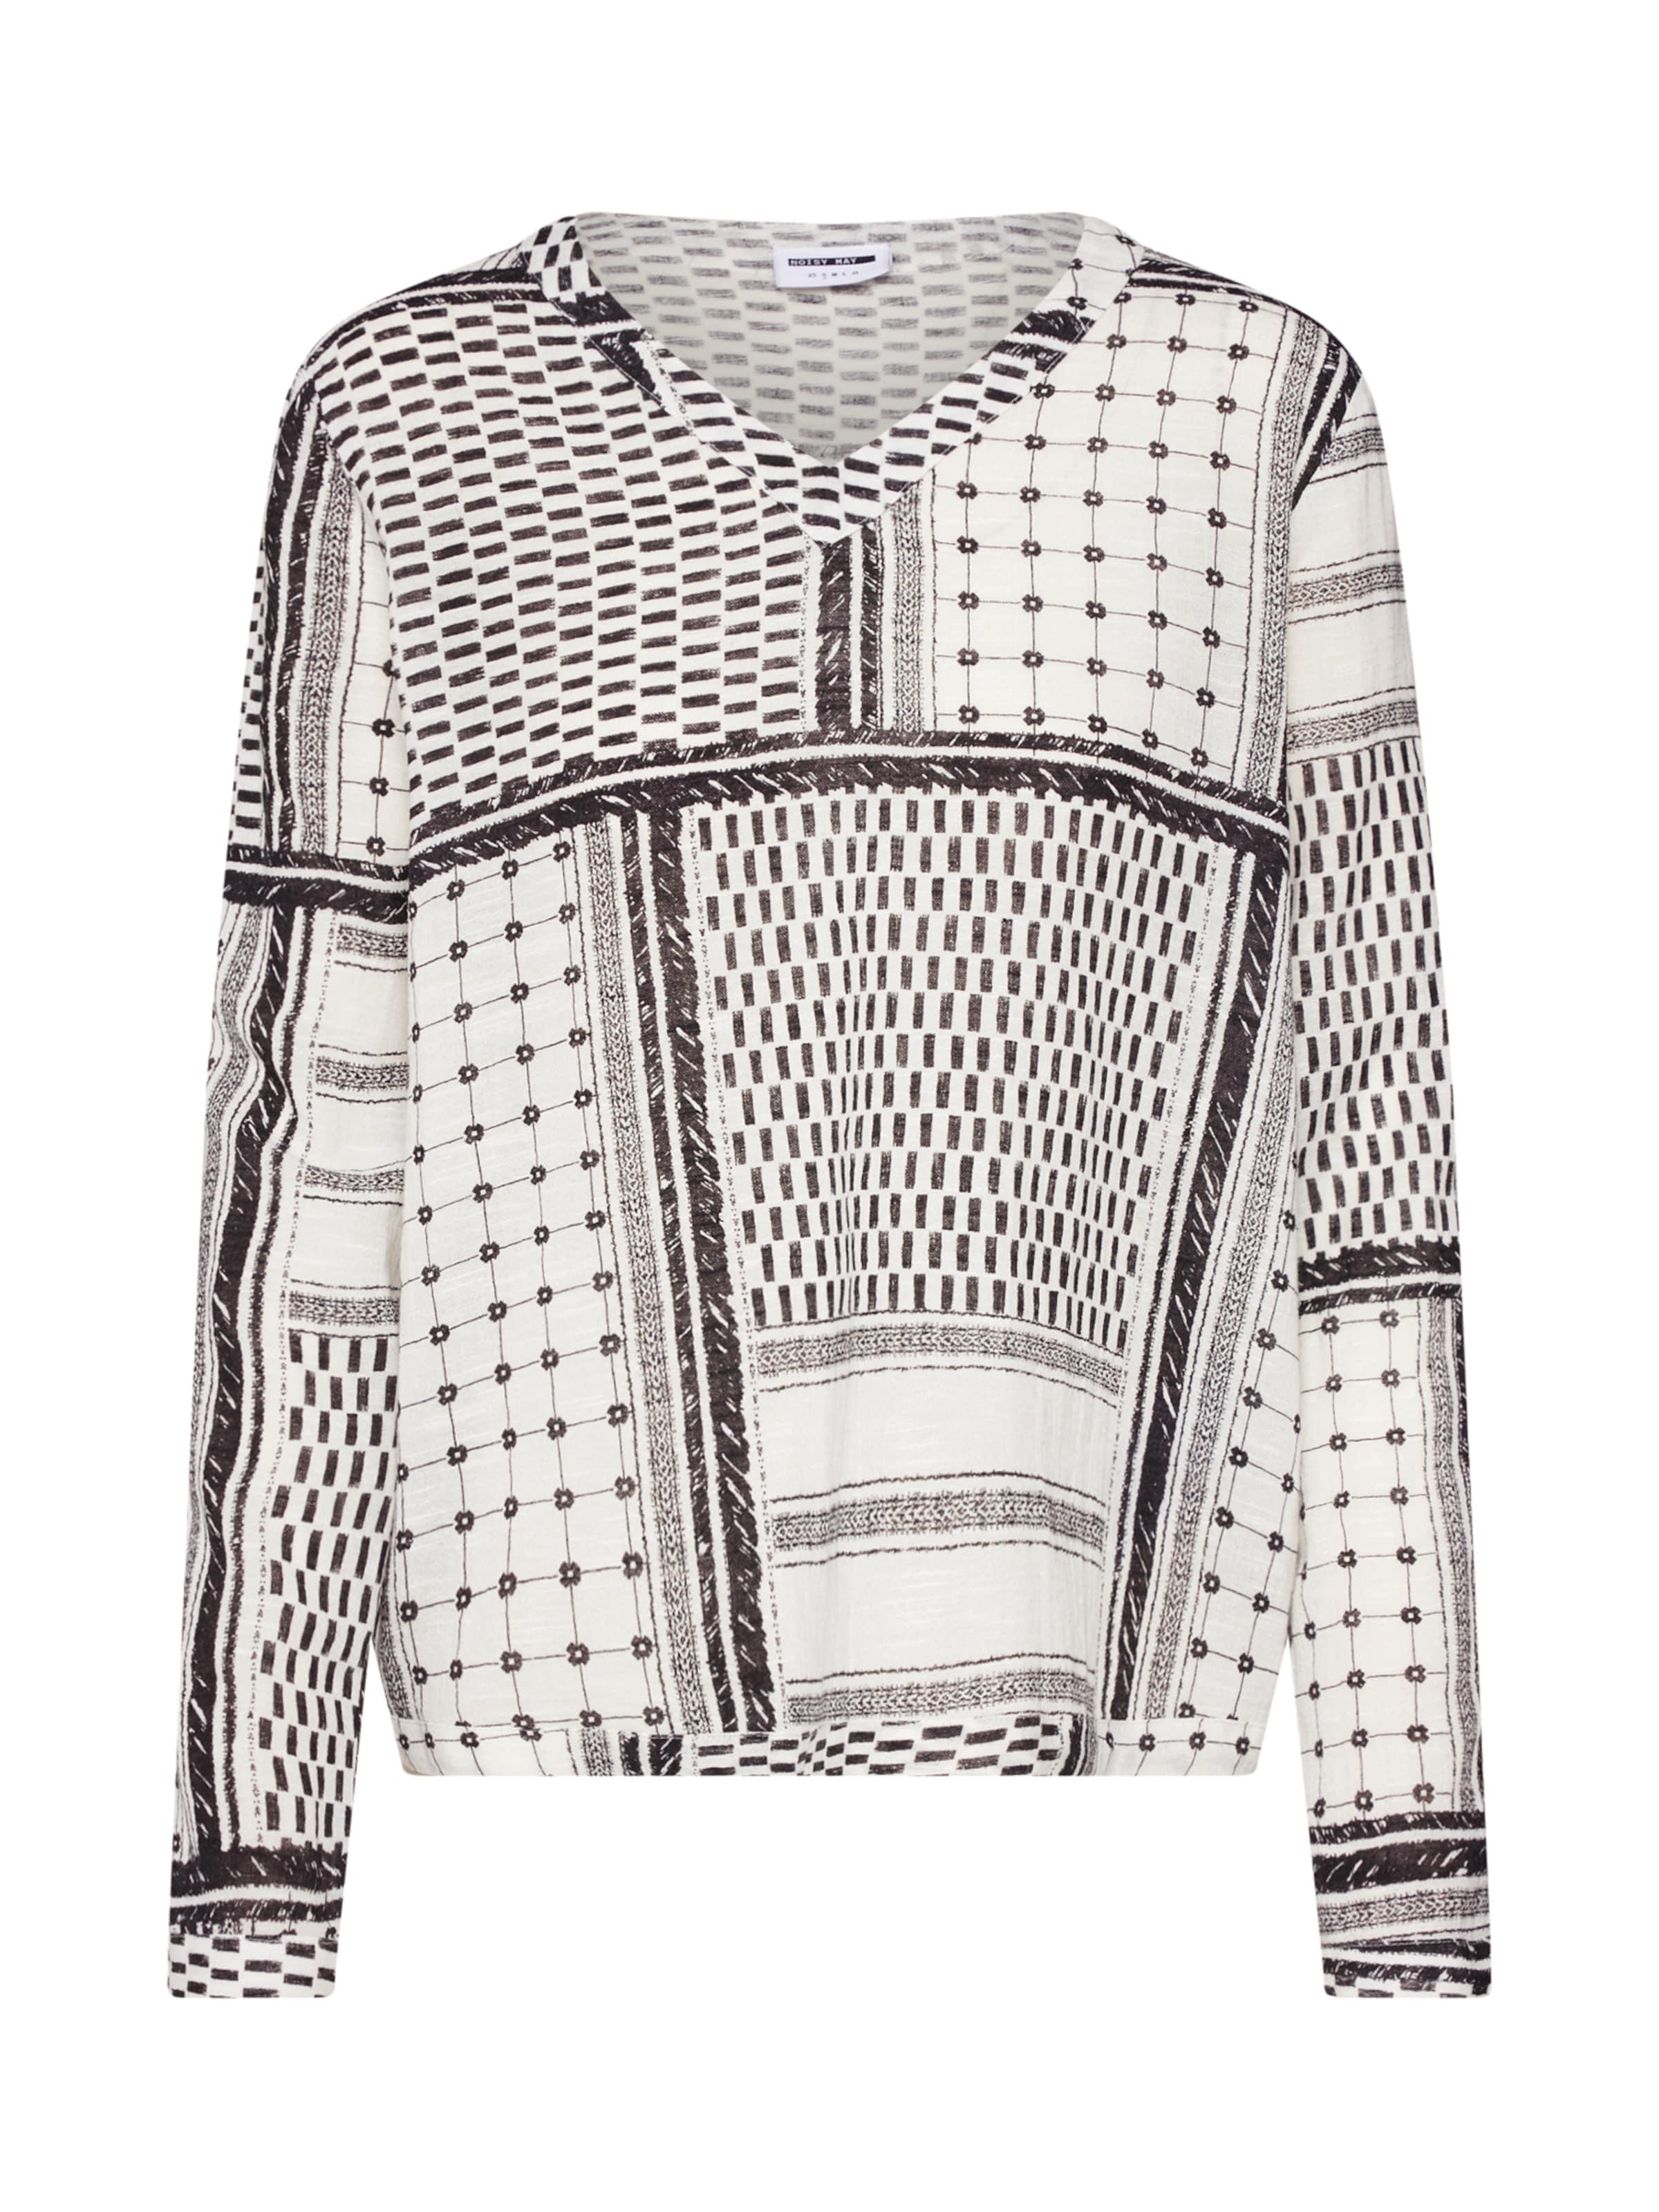 Noisy NoirBlanc 'azra' May shirt En T lcuKJ3TF1